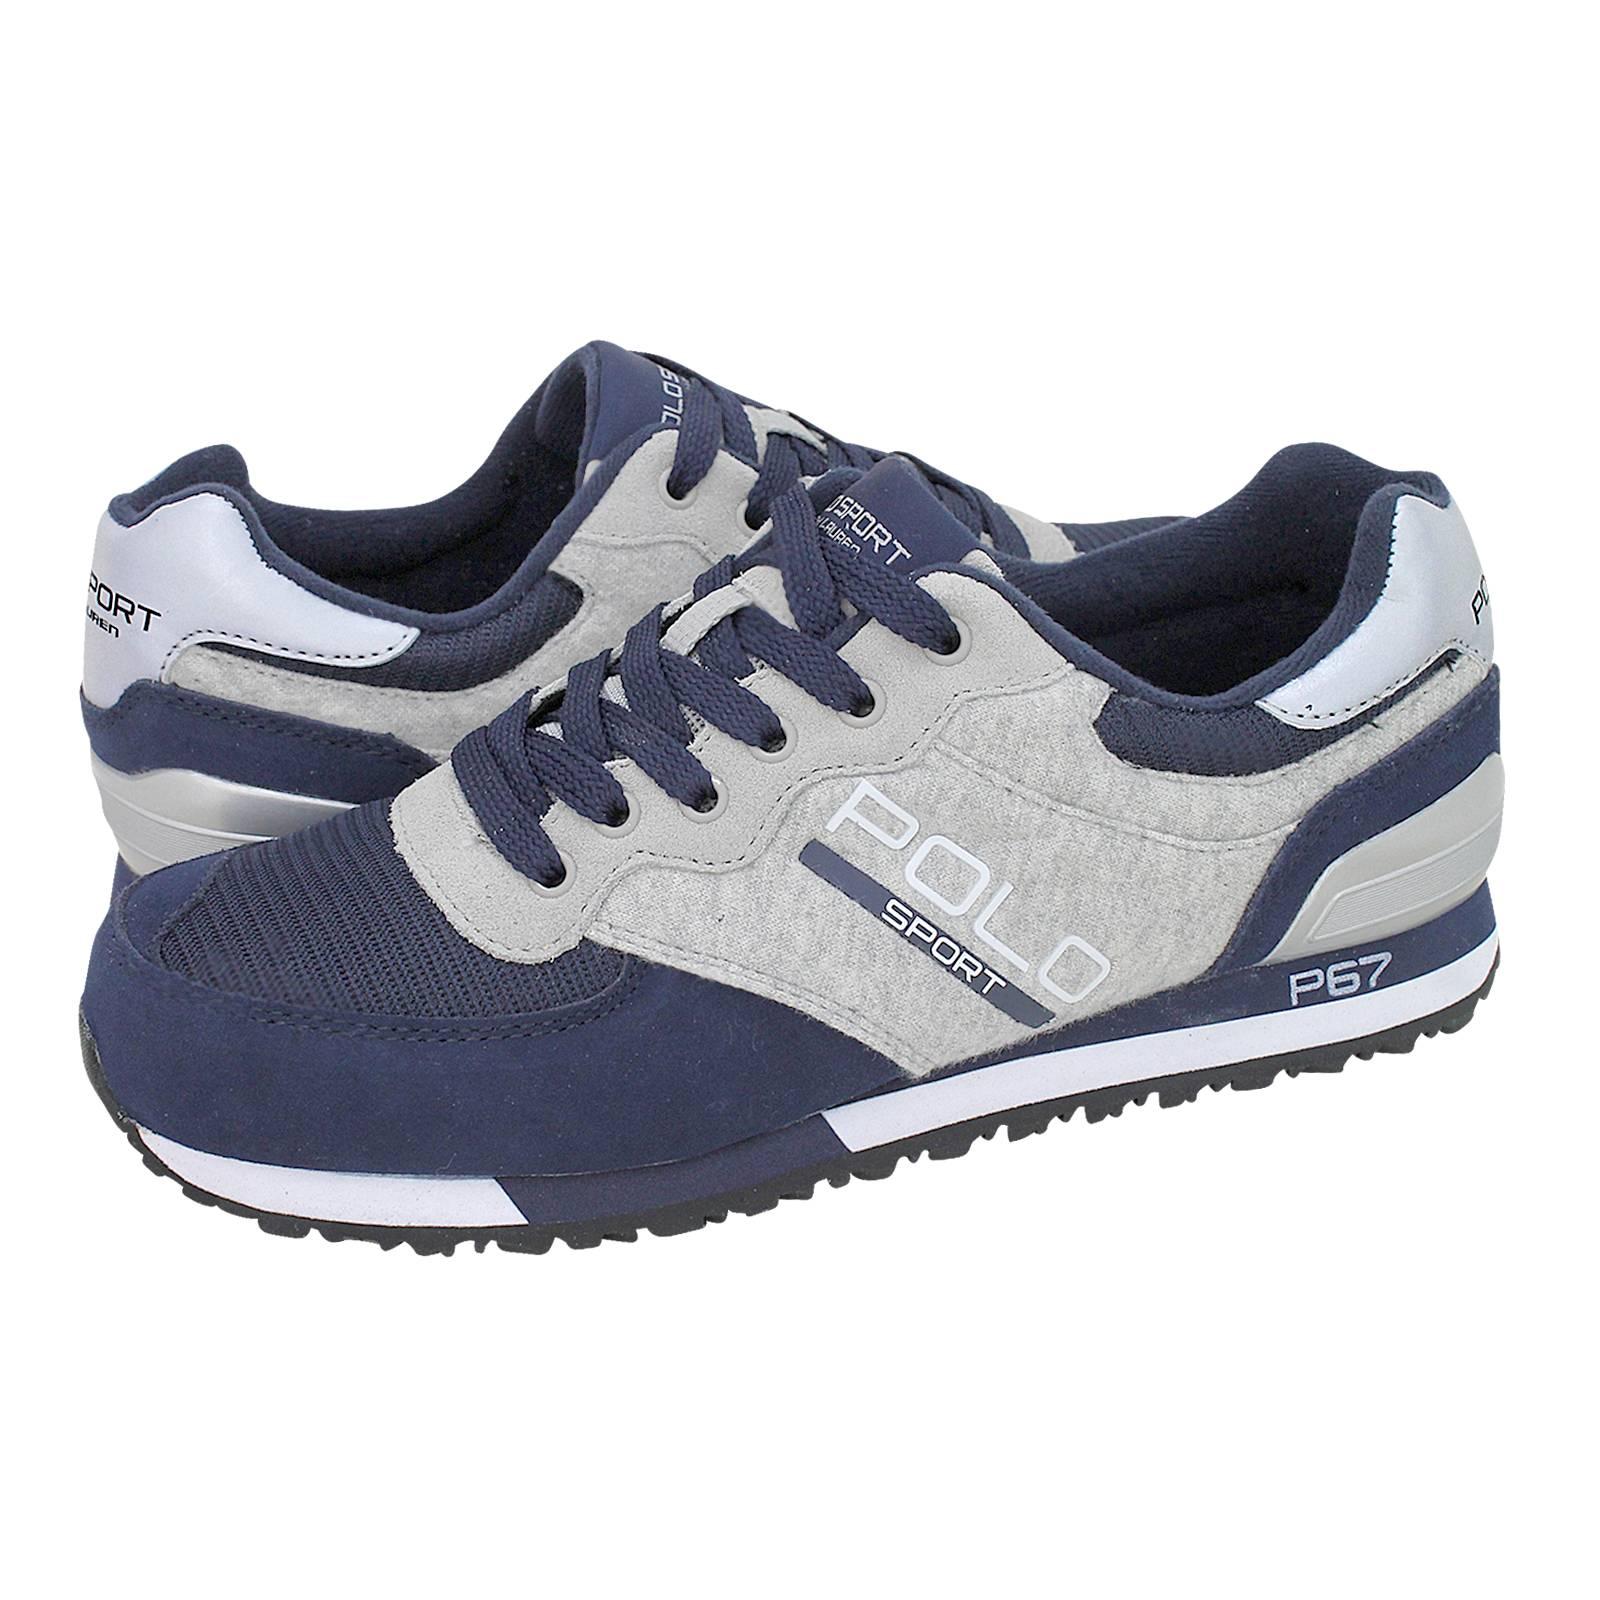 e5bad21a980 Coman - Ανδρικά παπούτσια casual Polo Sport Ralph Lauren από καστορι ...